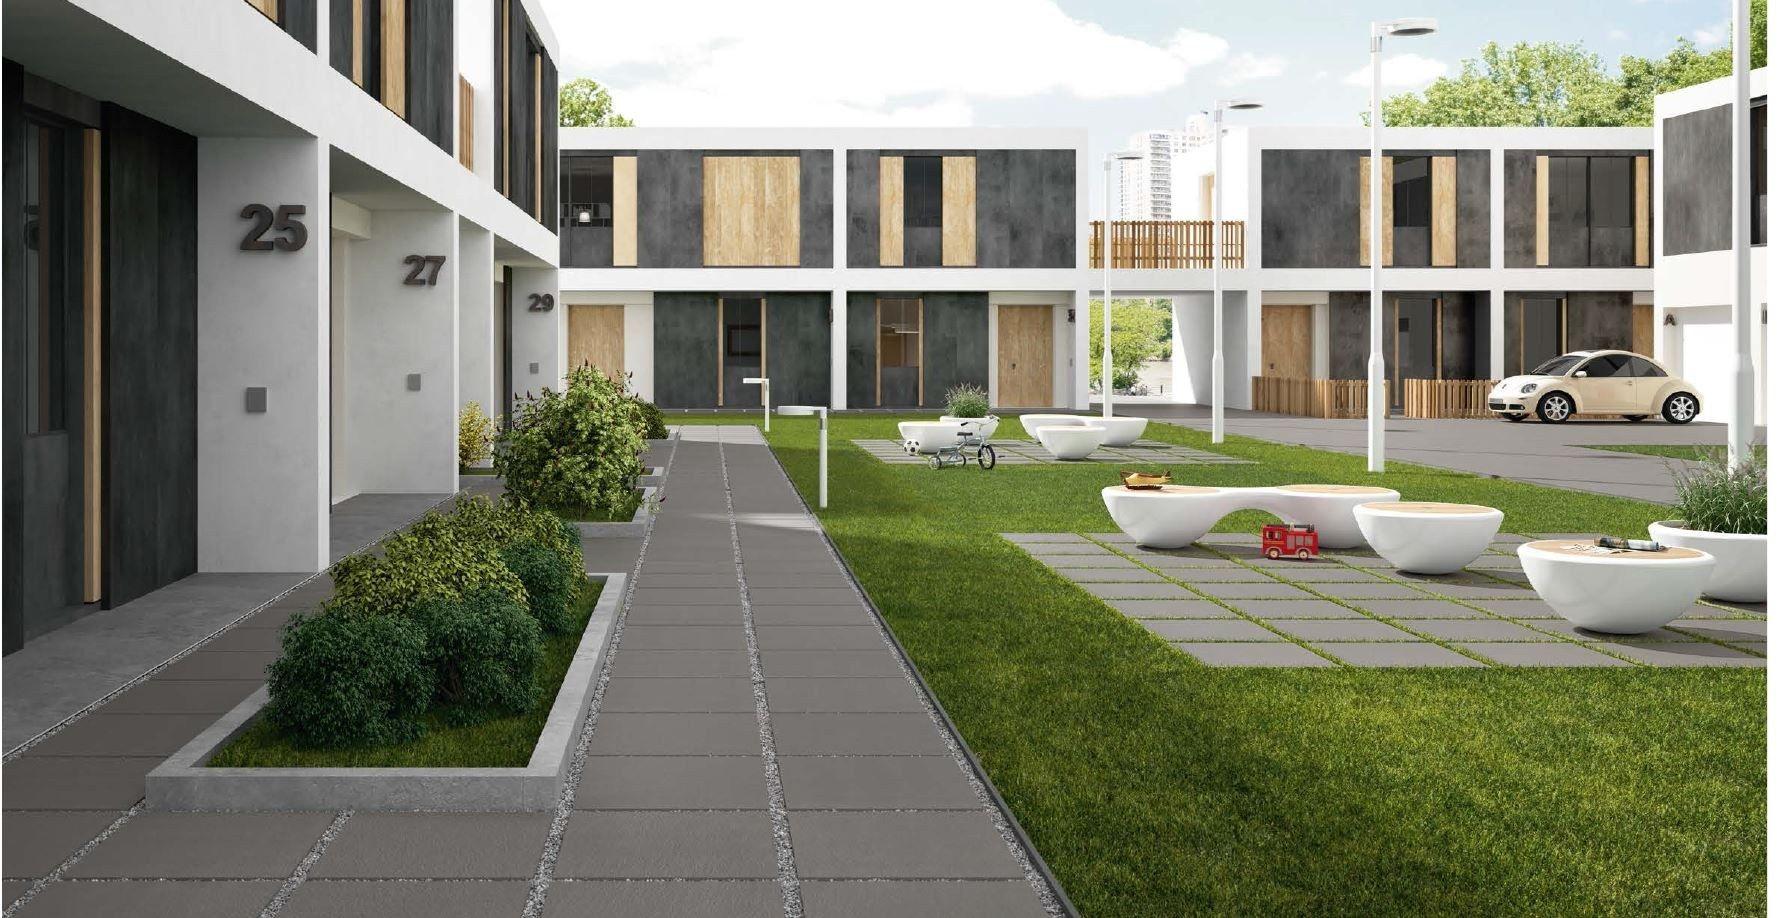 carrelage ext rieur en gr s c rame sistemn20 by marazzi. Black Bedroom Furniture Sets. Home Design Ideas